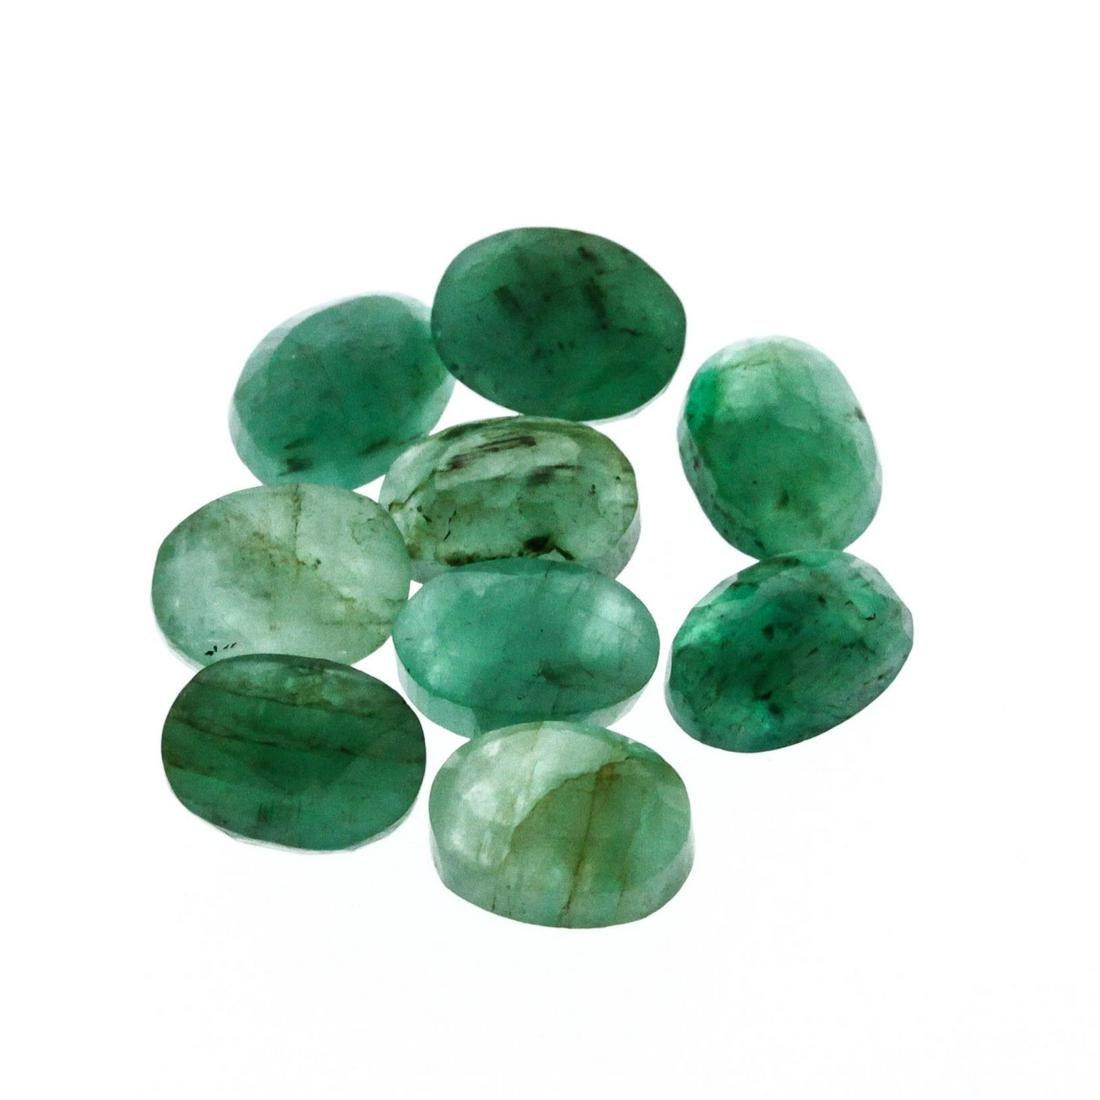 12.03 cts. Oval Cut Natural Emerald Parcel